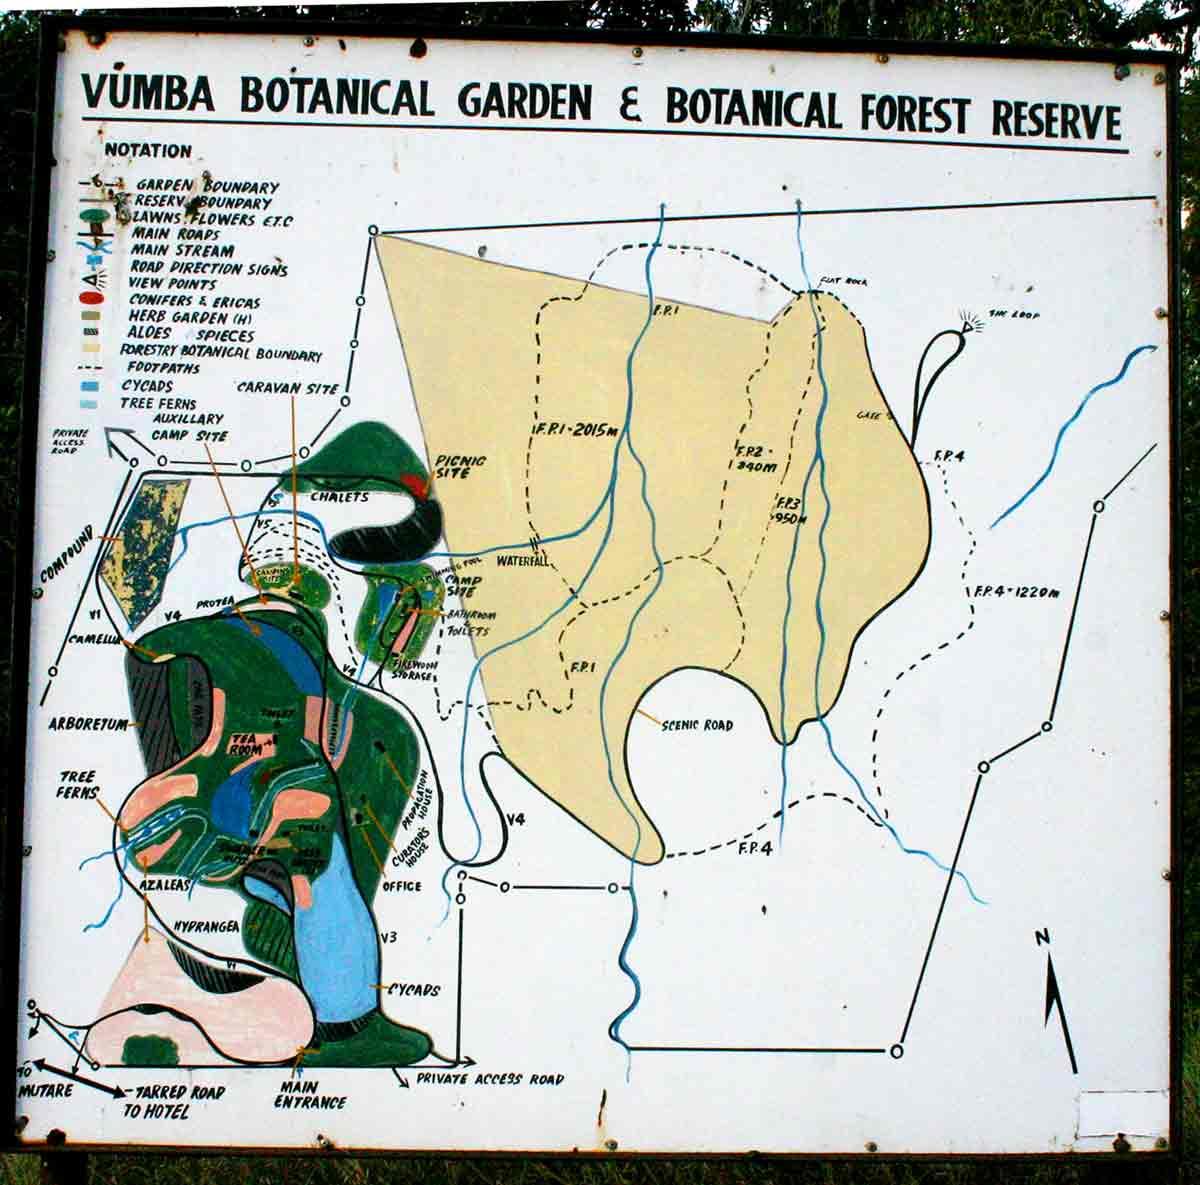 Map of Vumba Botanic Gardens.